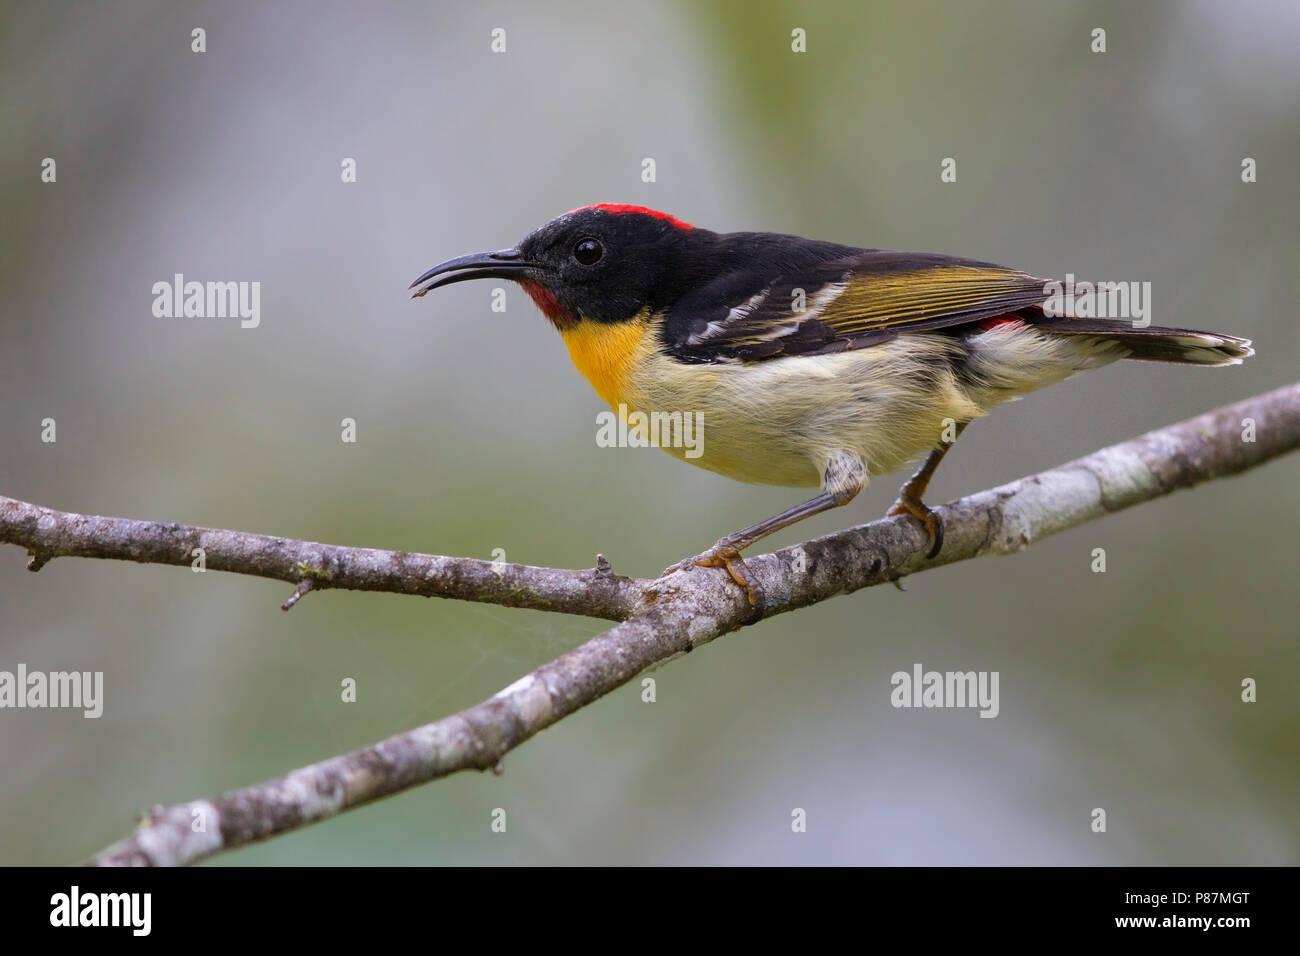 Orange-breasted Myzomela (Myzomela jugularis) the smallest resident avian species on Fiji. - Stock Image